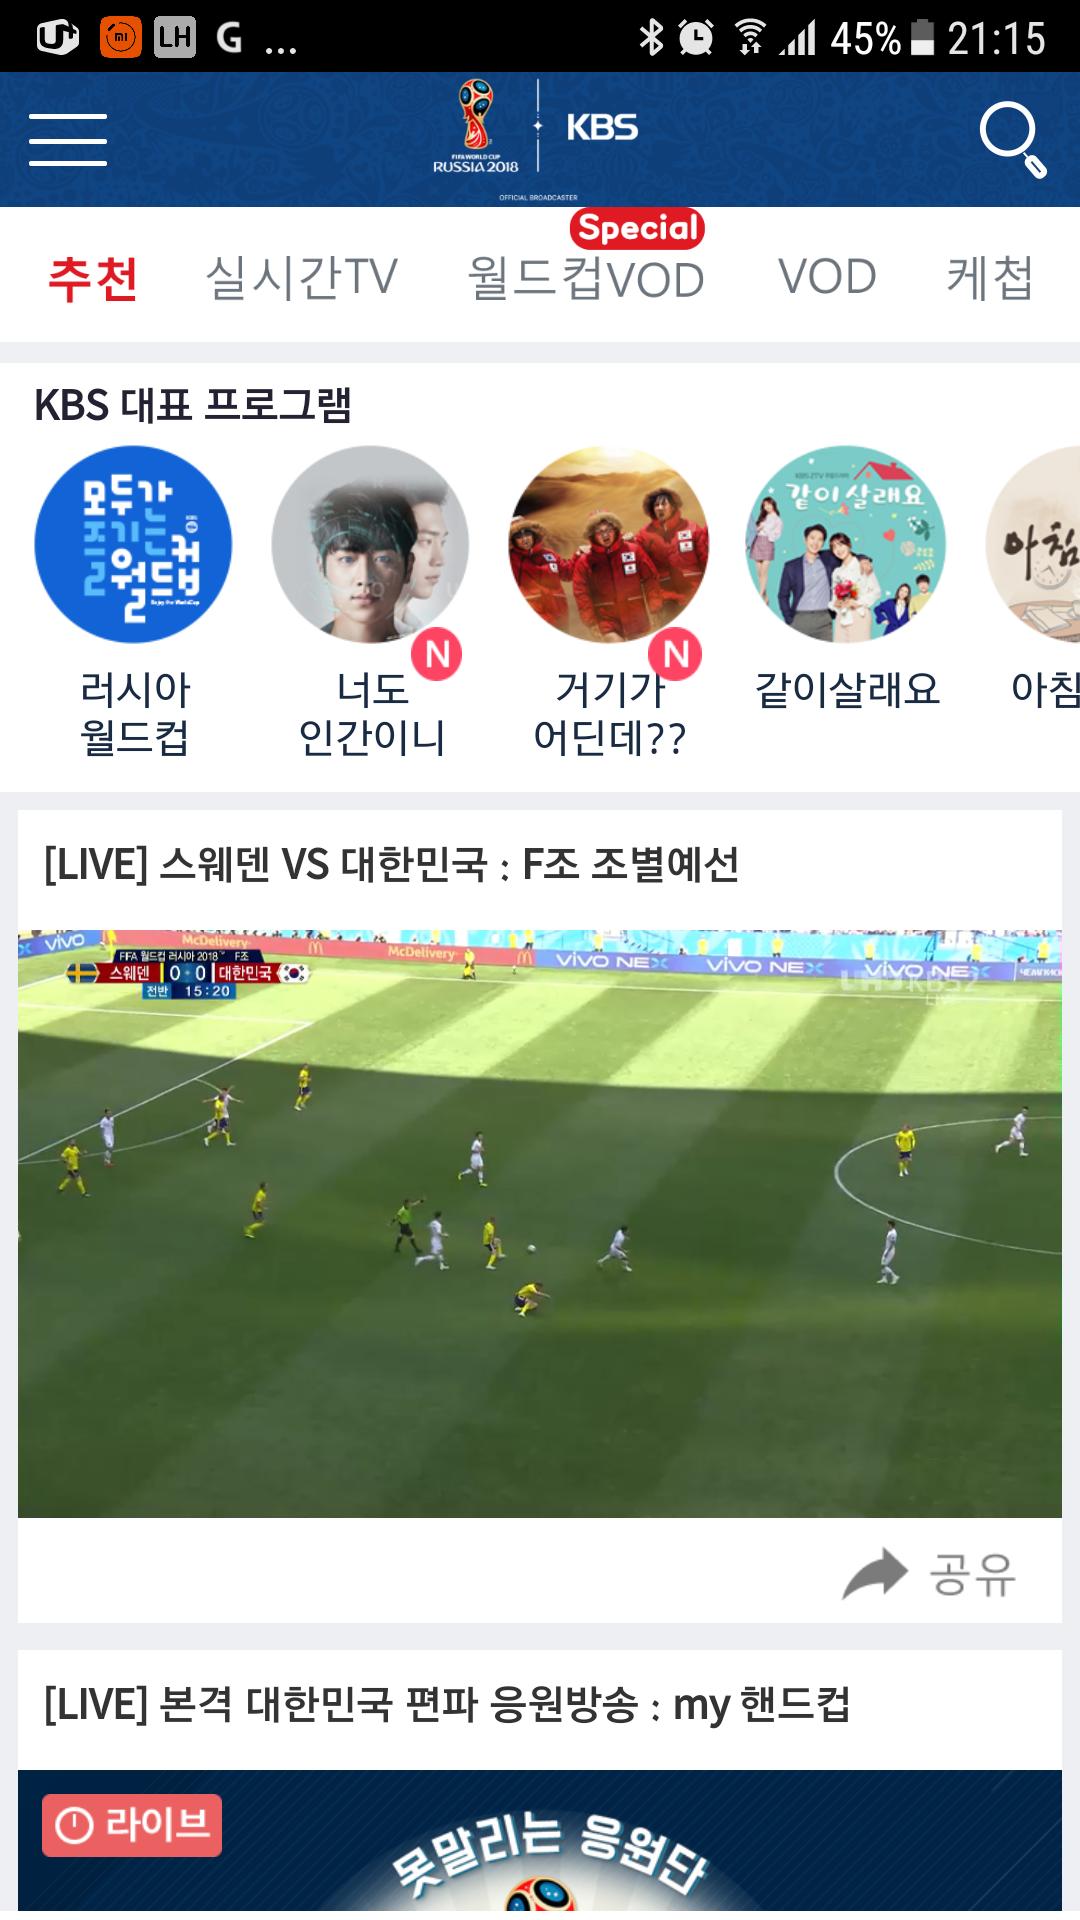 TV없는 아빠의 월드컵 두번째-KBS와 월드컵 - 러시...